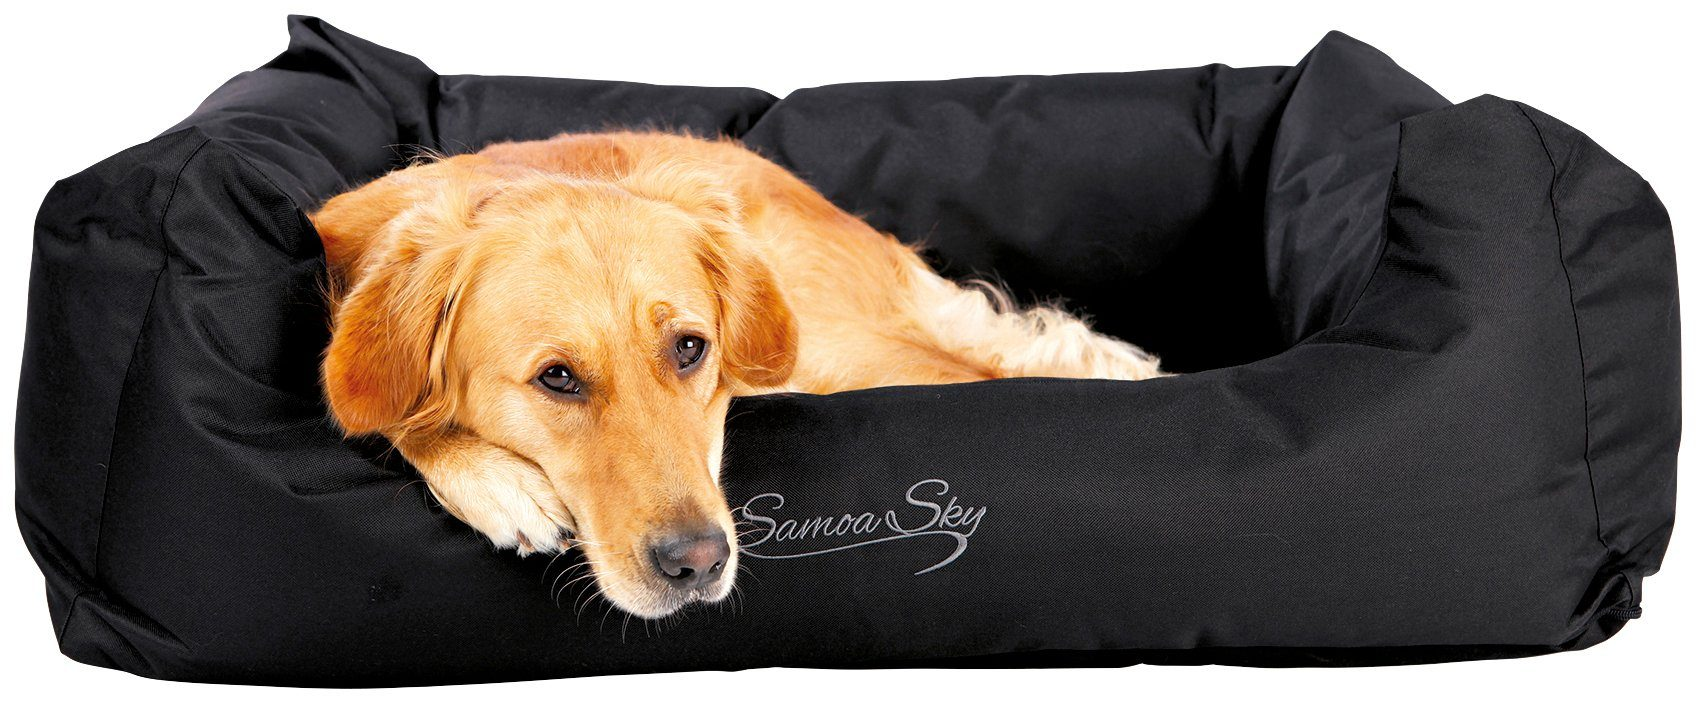 Hunde-Bett »Samoa Sky«, BxL: 80x65 cm, schwarz